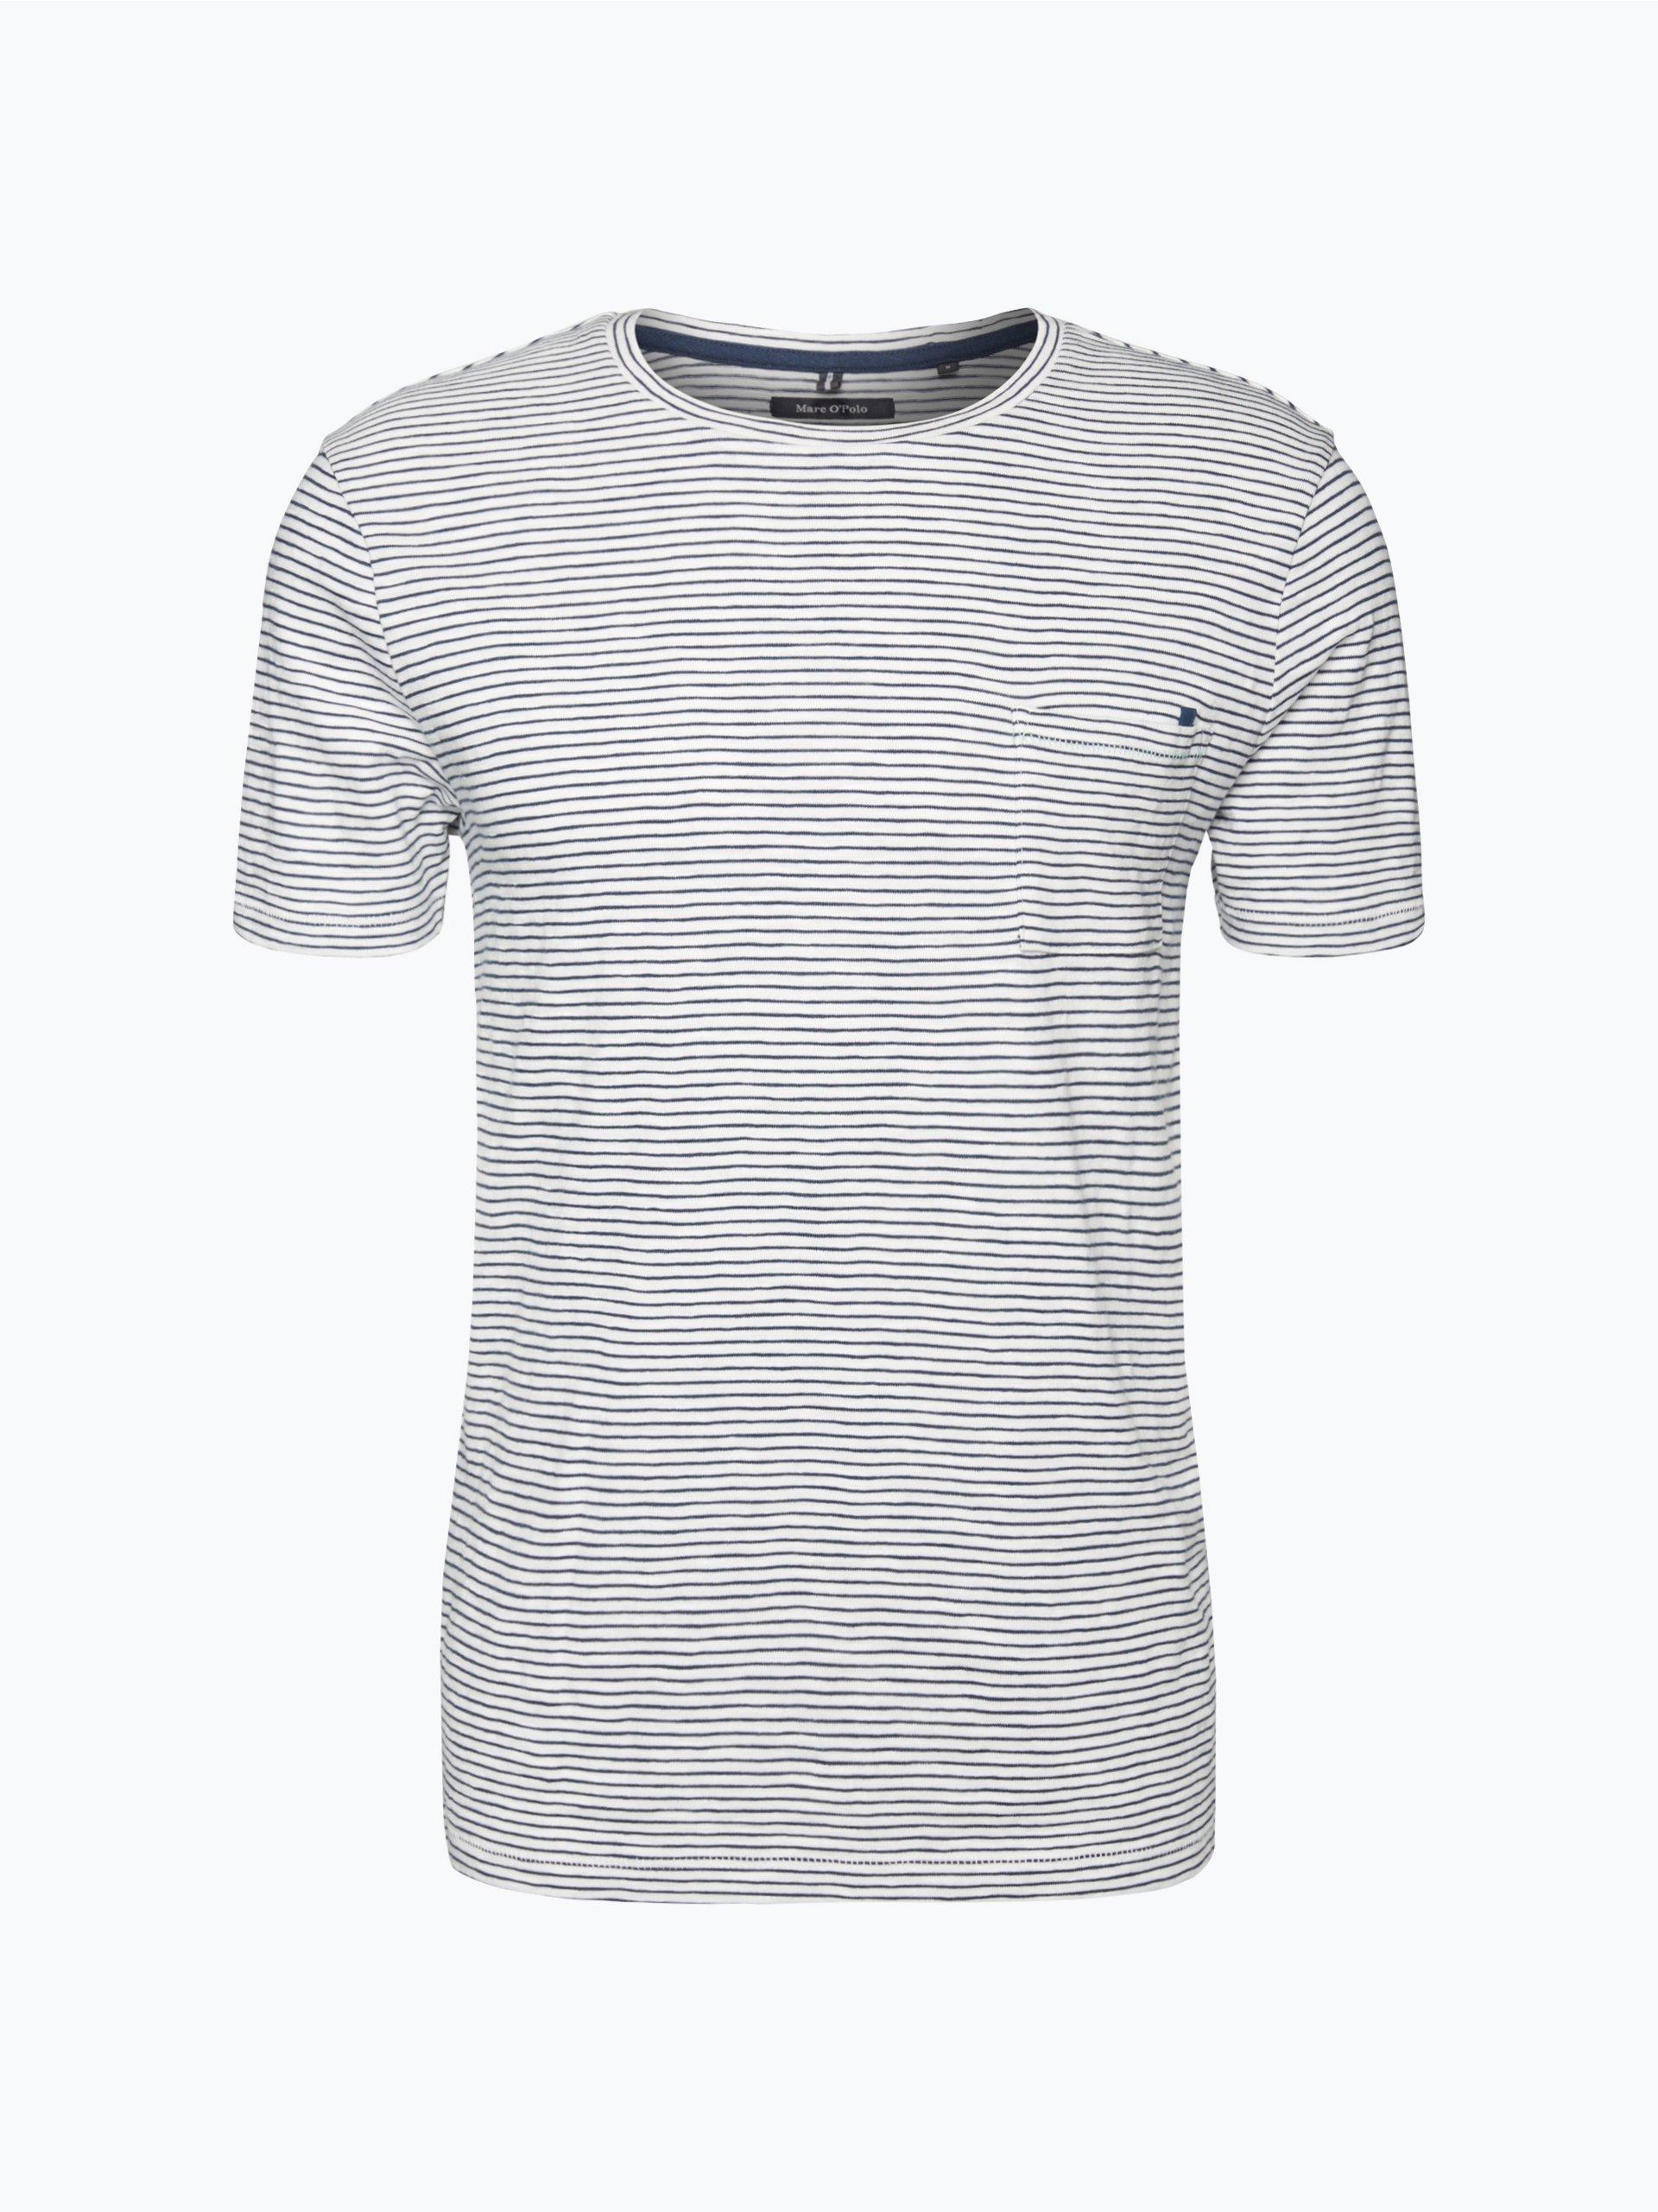 marc o 39 polo herren t shirt wei gestreift online kaufen. Black Bedroom Furniture Sets. Home Design Ideas